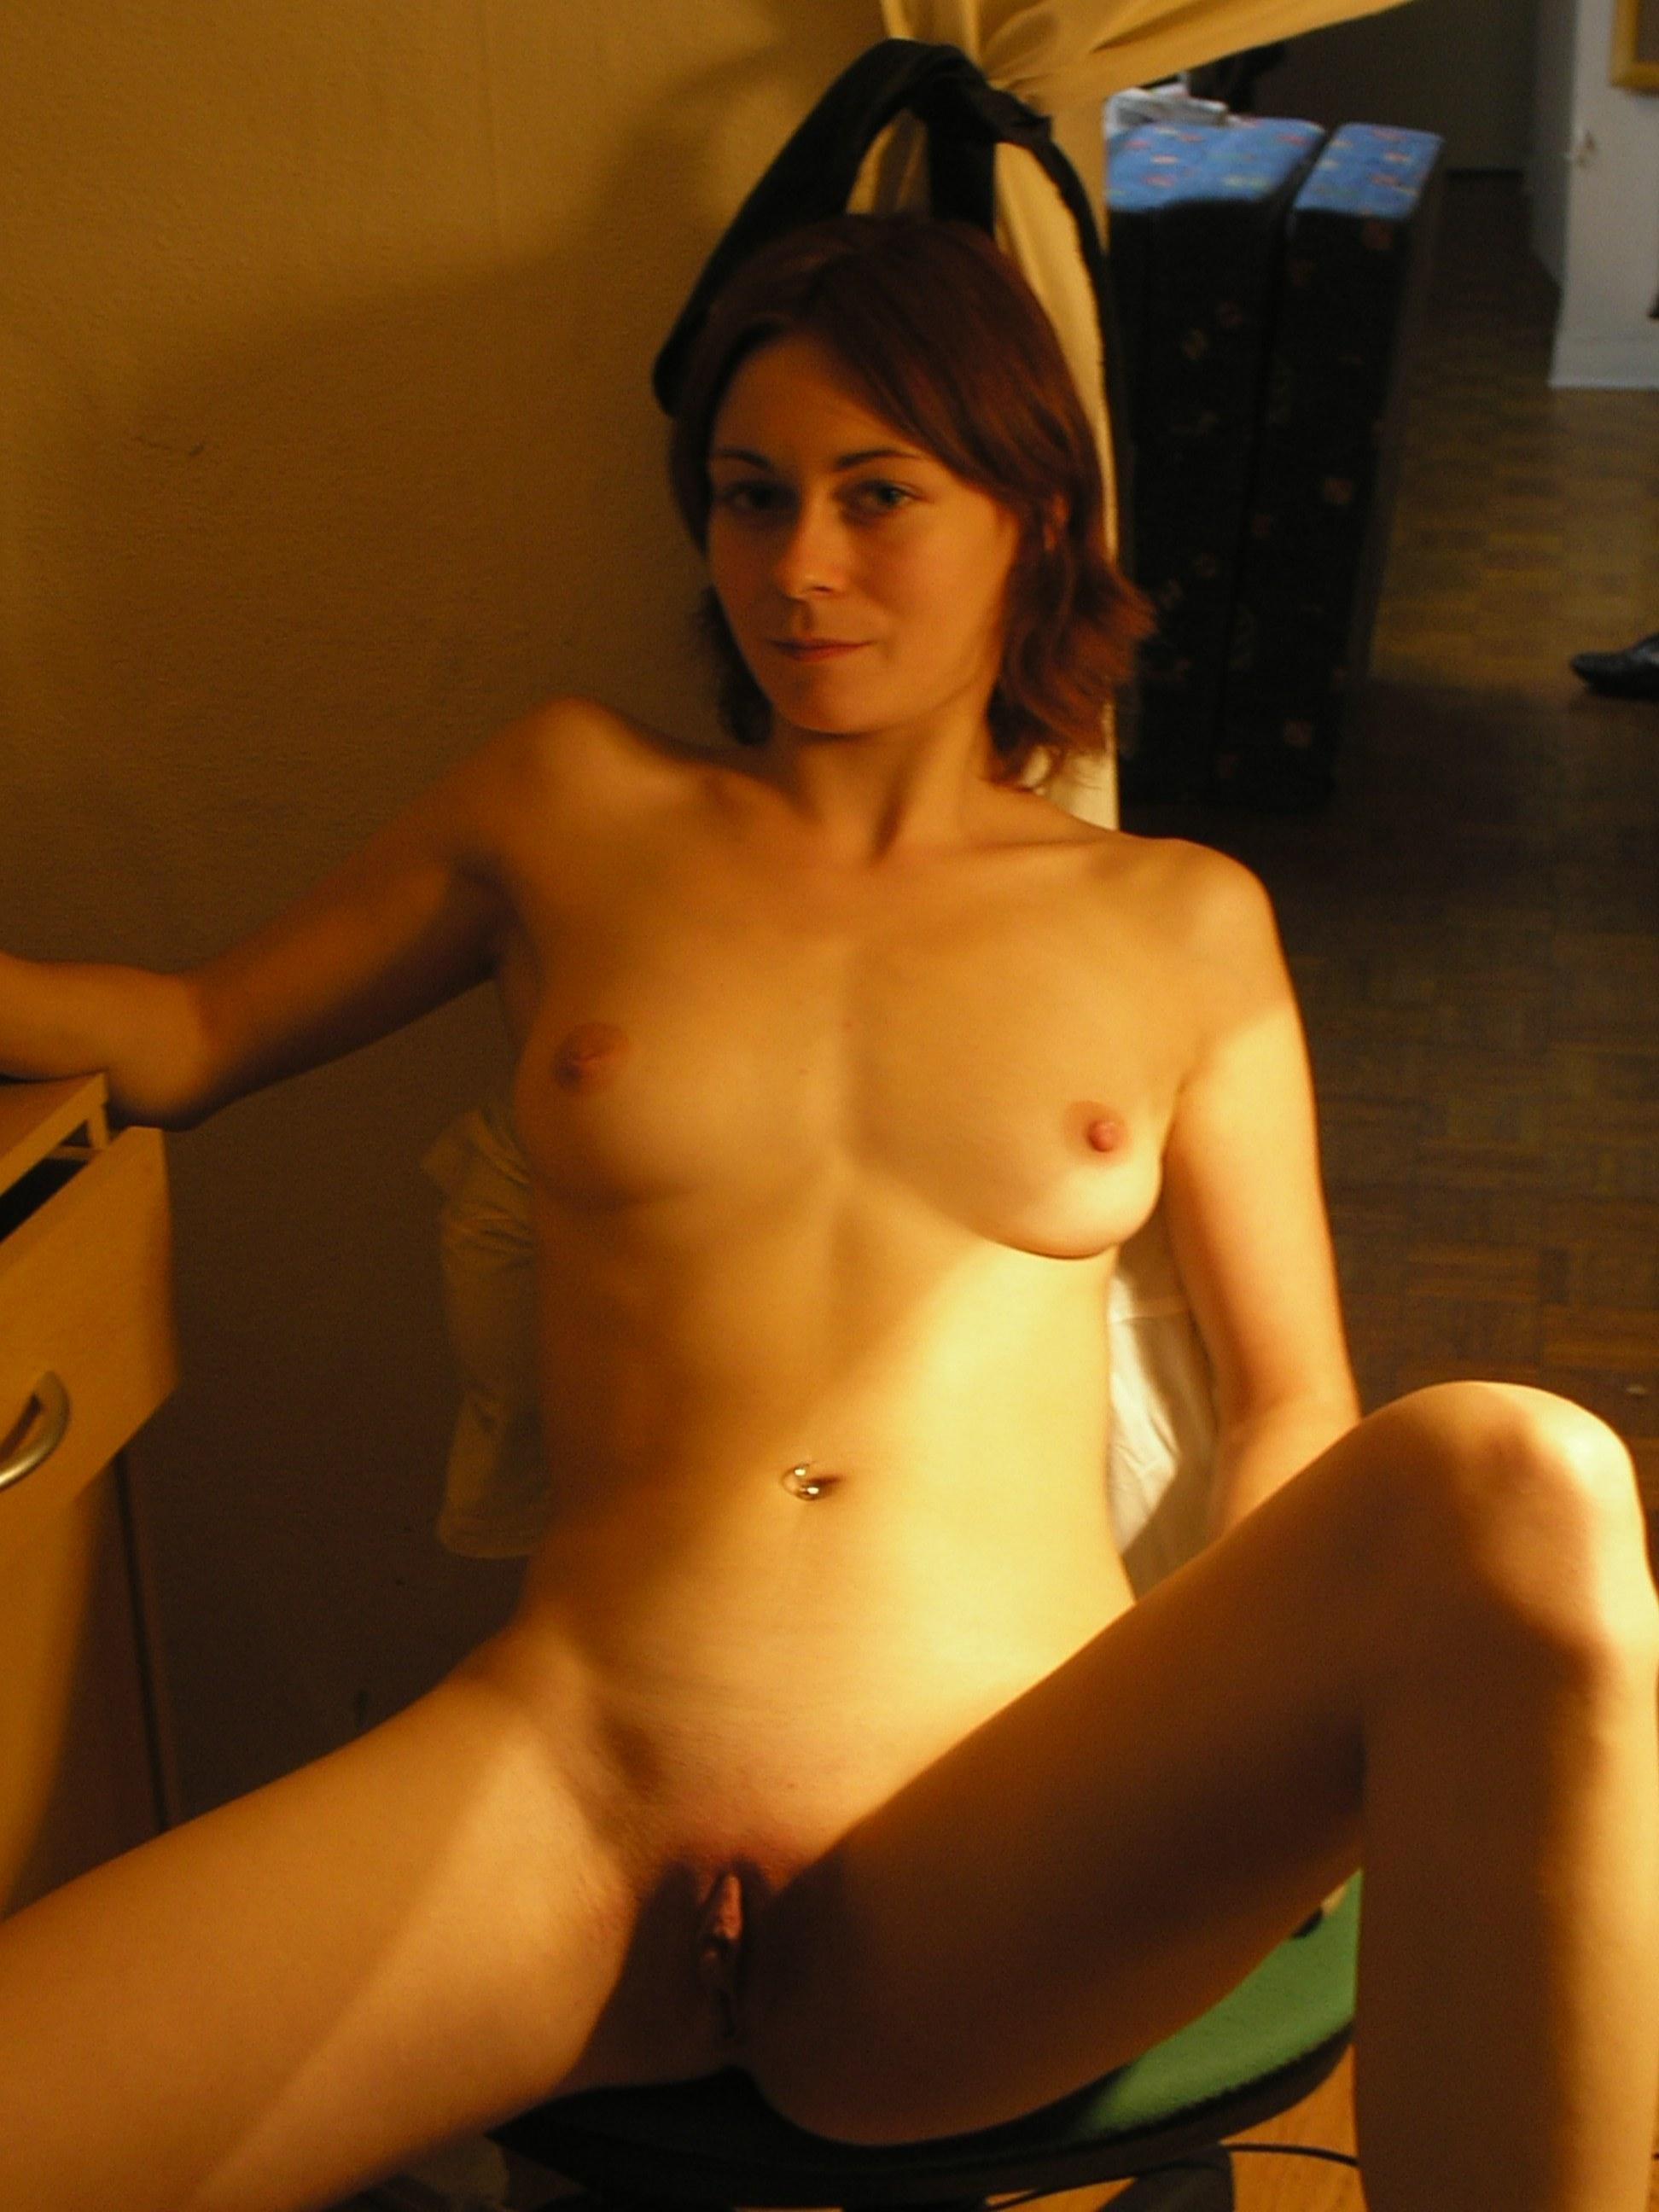 Chatte poilue photo escorts trans